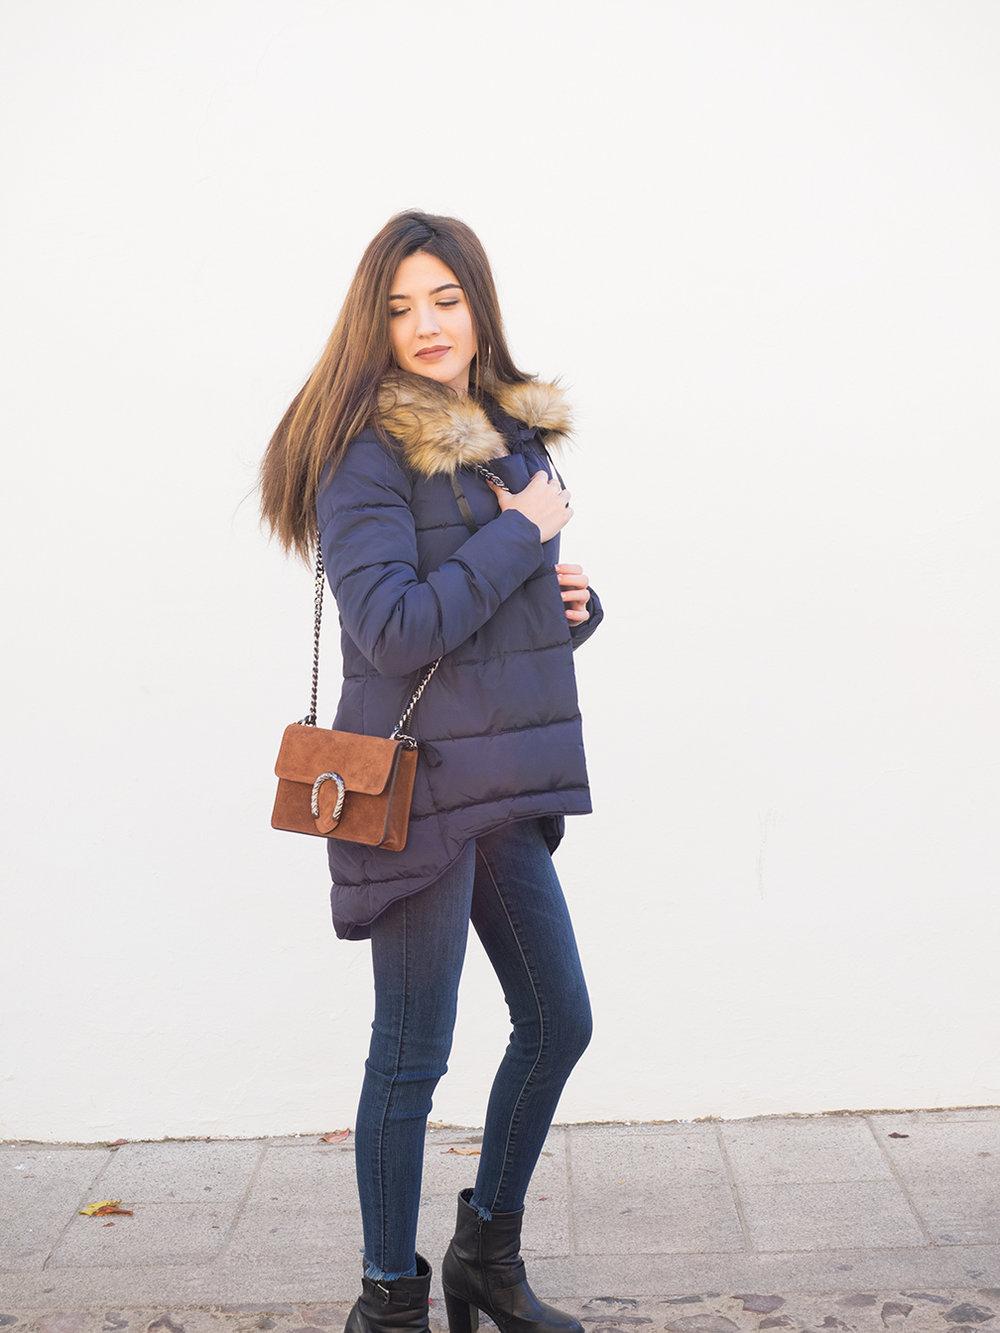 hadaandharry abrigo coat winter blue azul moda fashion 02 2017-11-11.jpg